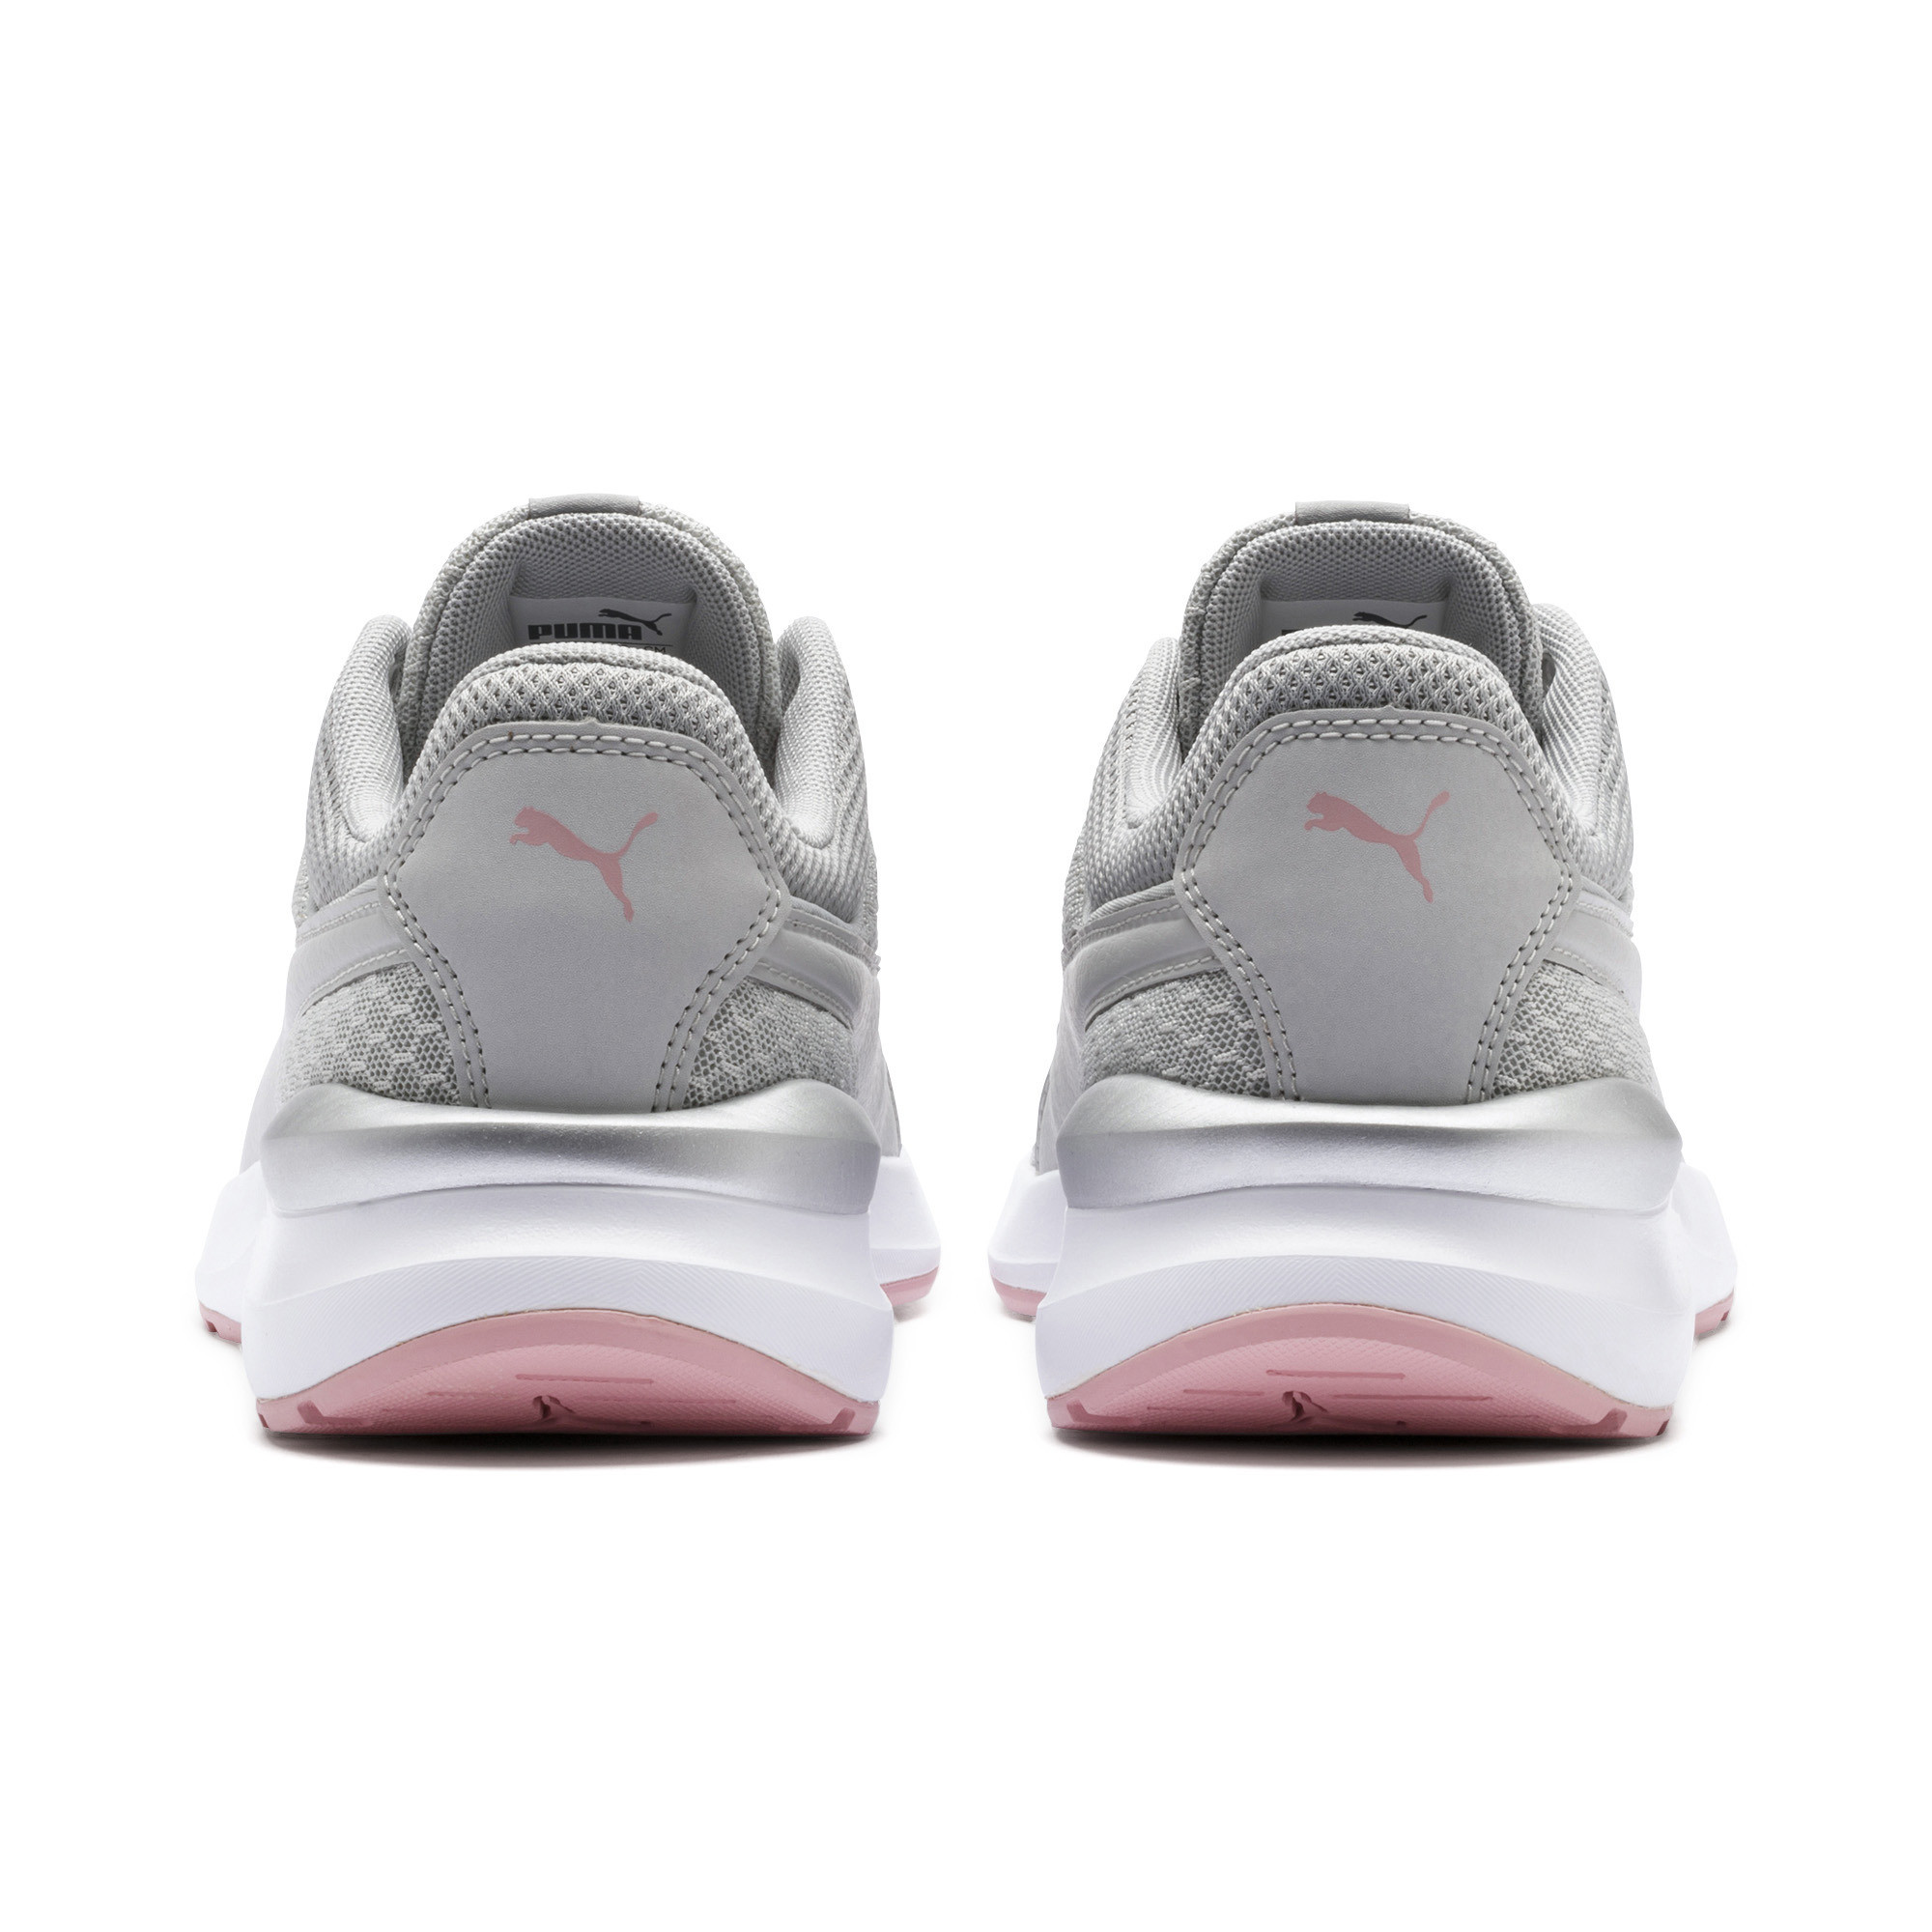 PUMA-Adela-Core-Women-s-Sneakers-Women-Shoe-Basics thumbnail 10